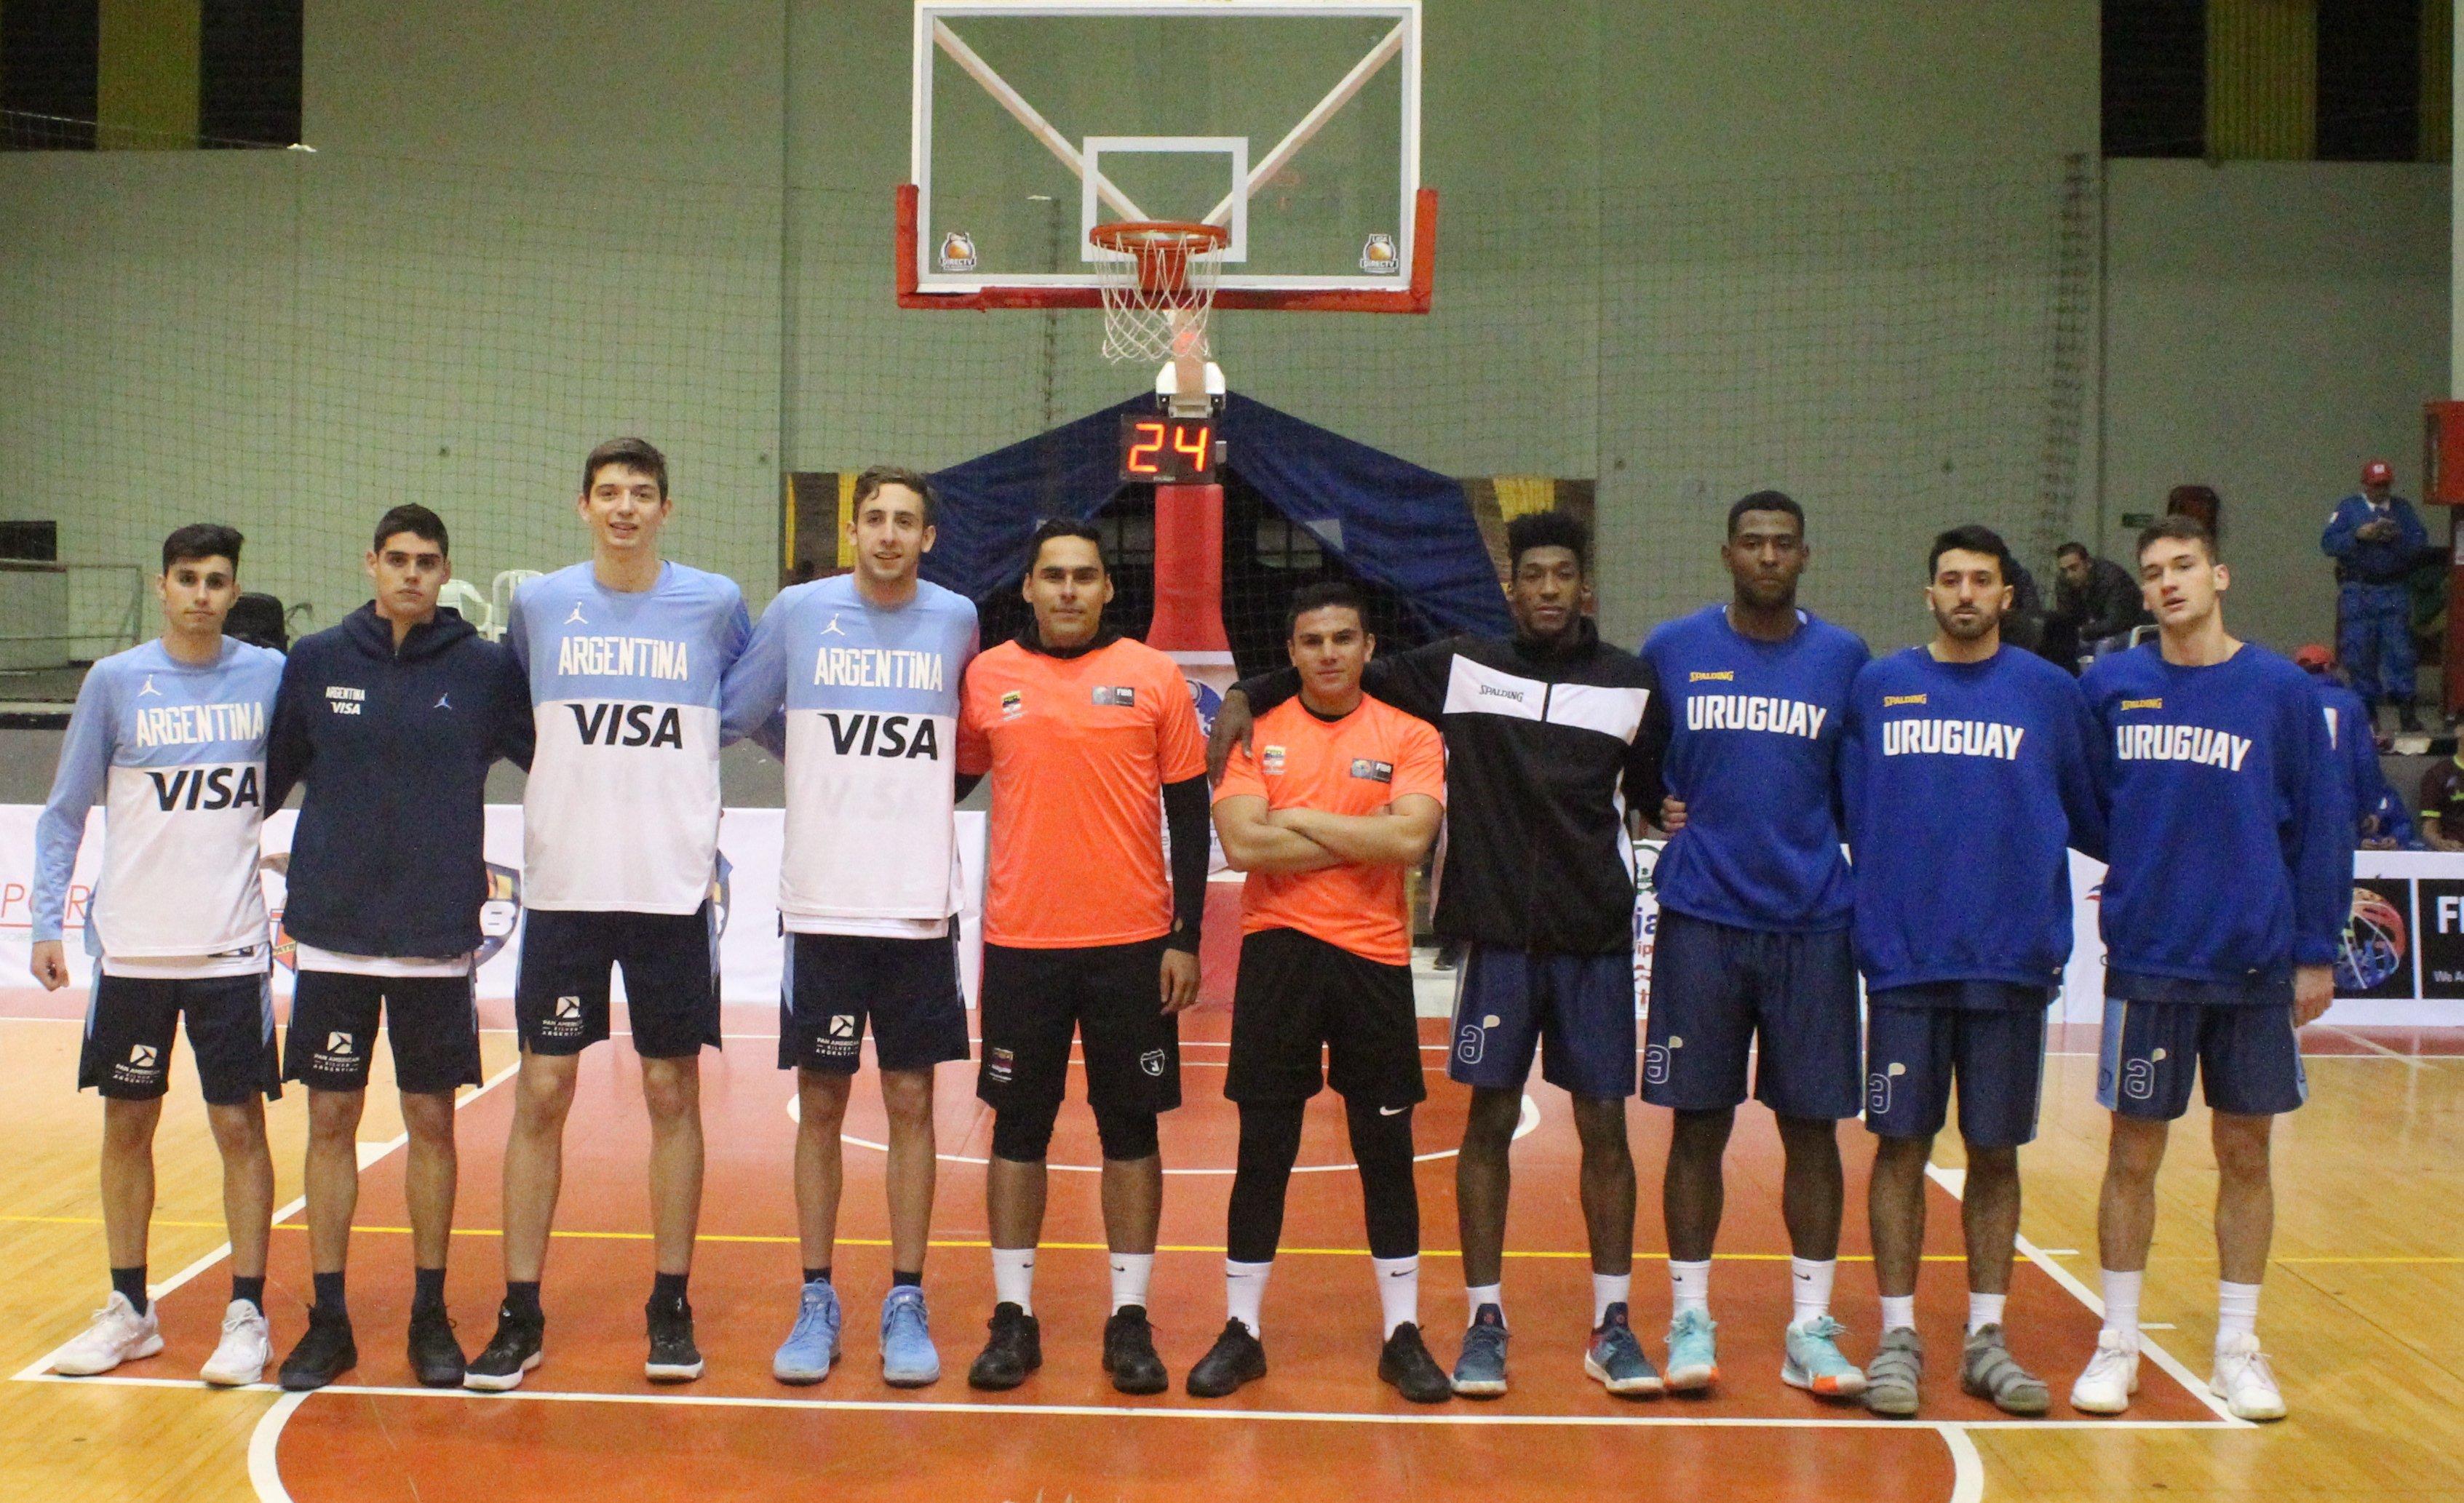 Argentina finalizó cuarta en el 3x3 del Sudamericano U21